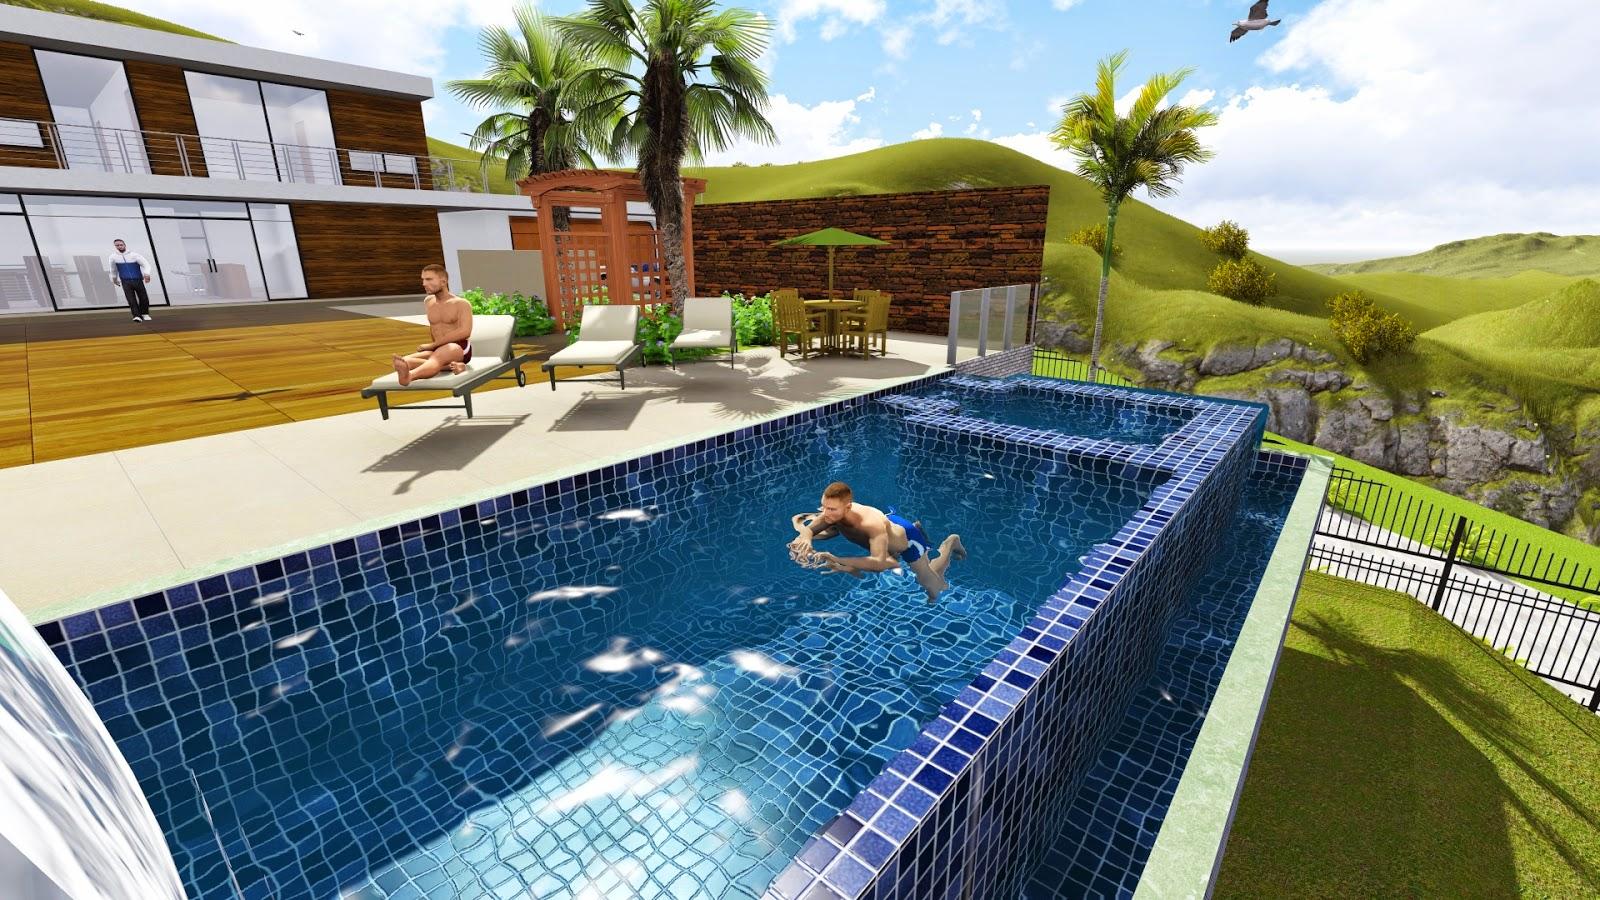 Projeto de piscina em 3d renderizado projetos de for Piscinas en autocad